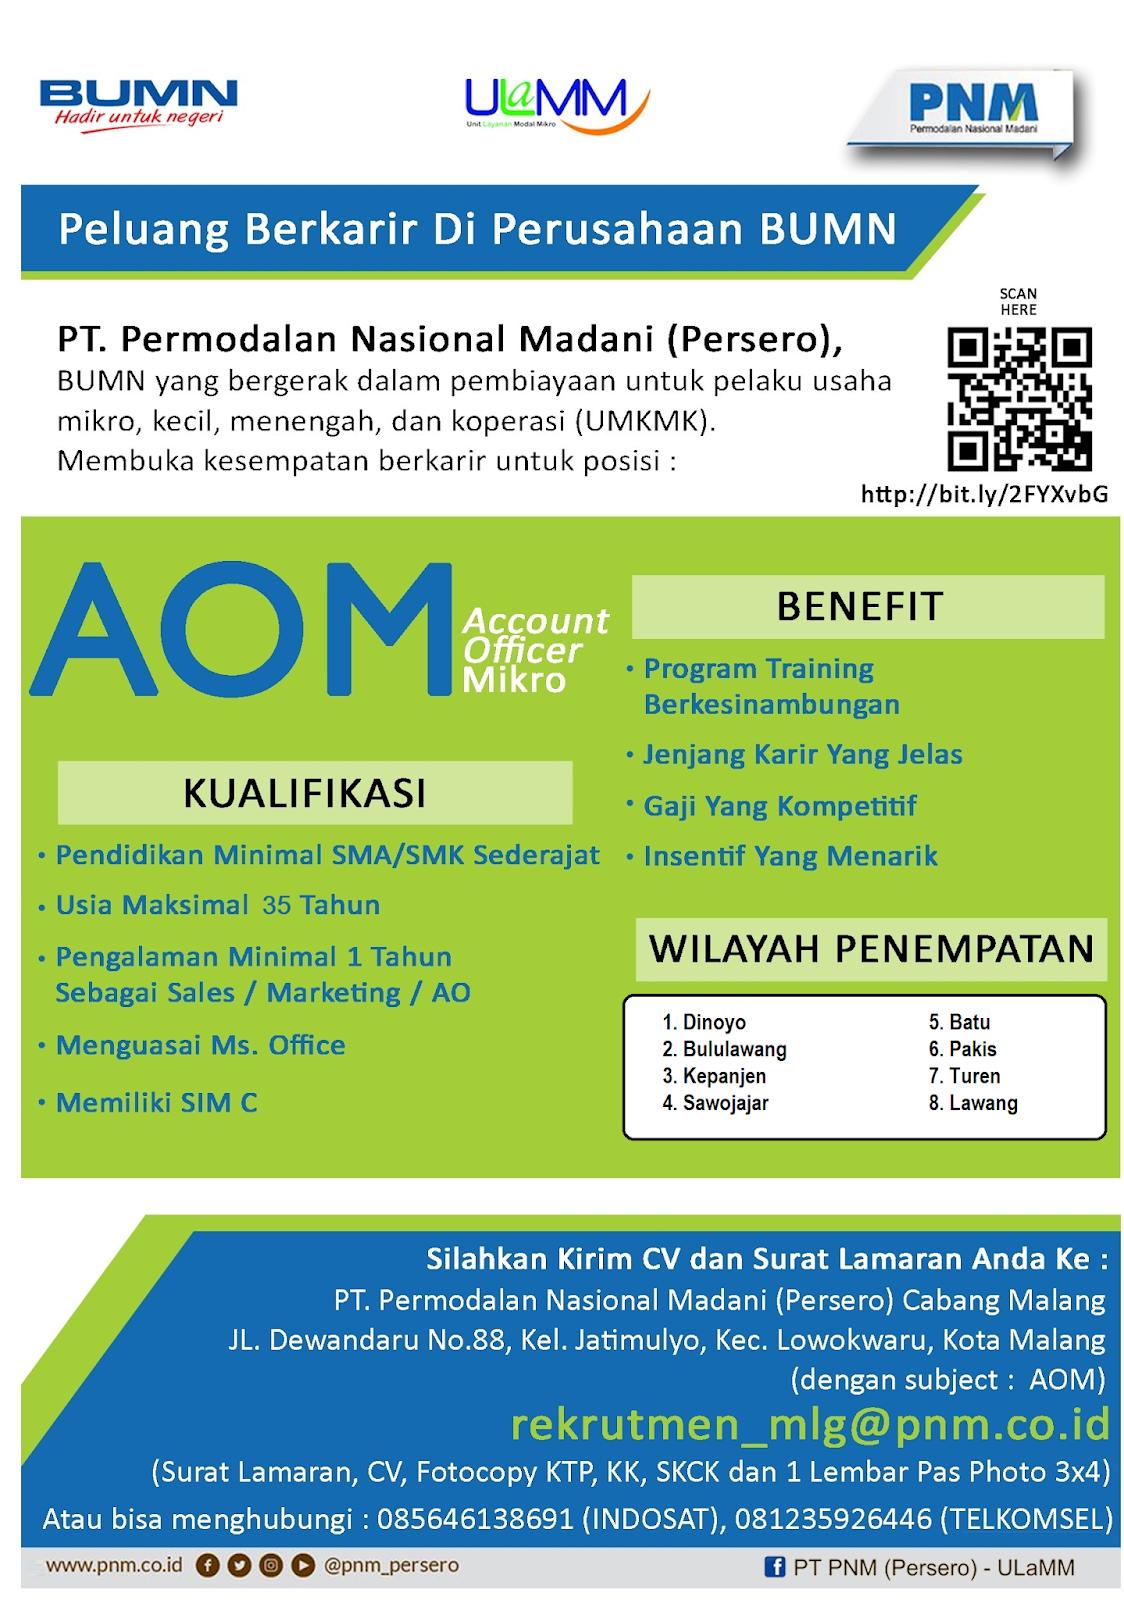 Lowongan Kerja BUMN PT Pemodalan Nasional Madani (Persero) Tingkat SMA Sederajat Agustus 2019